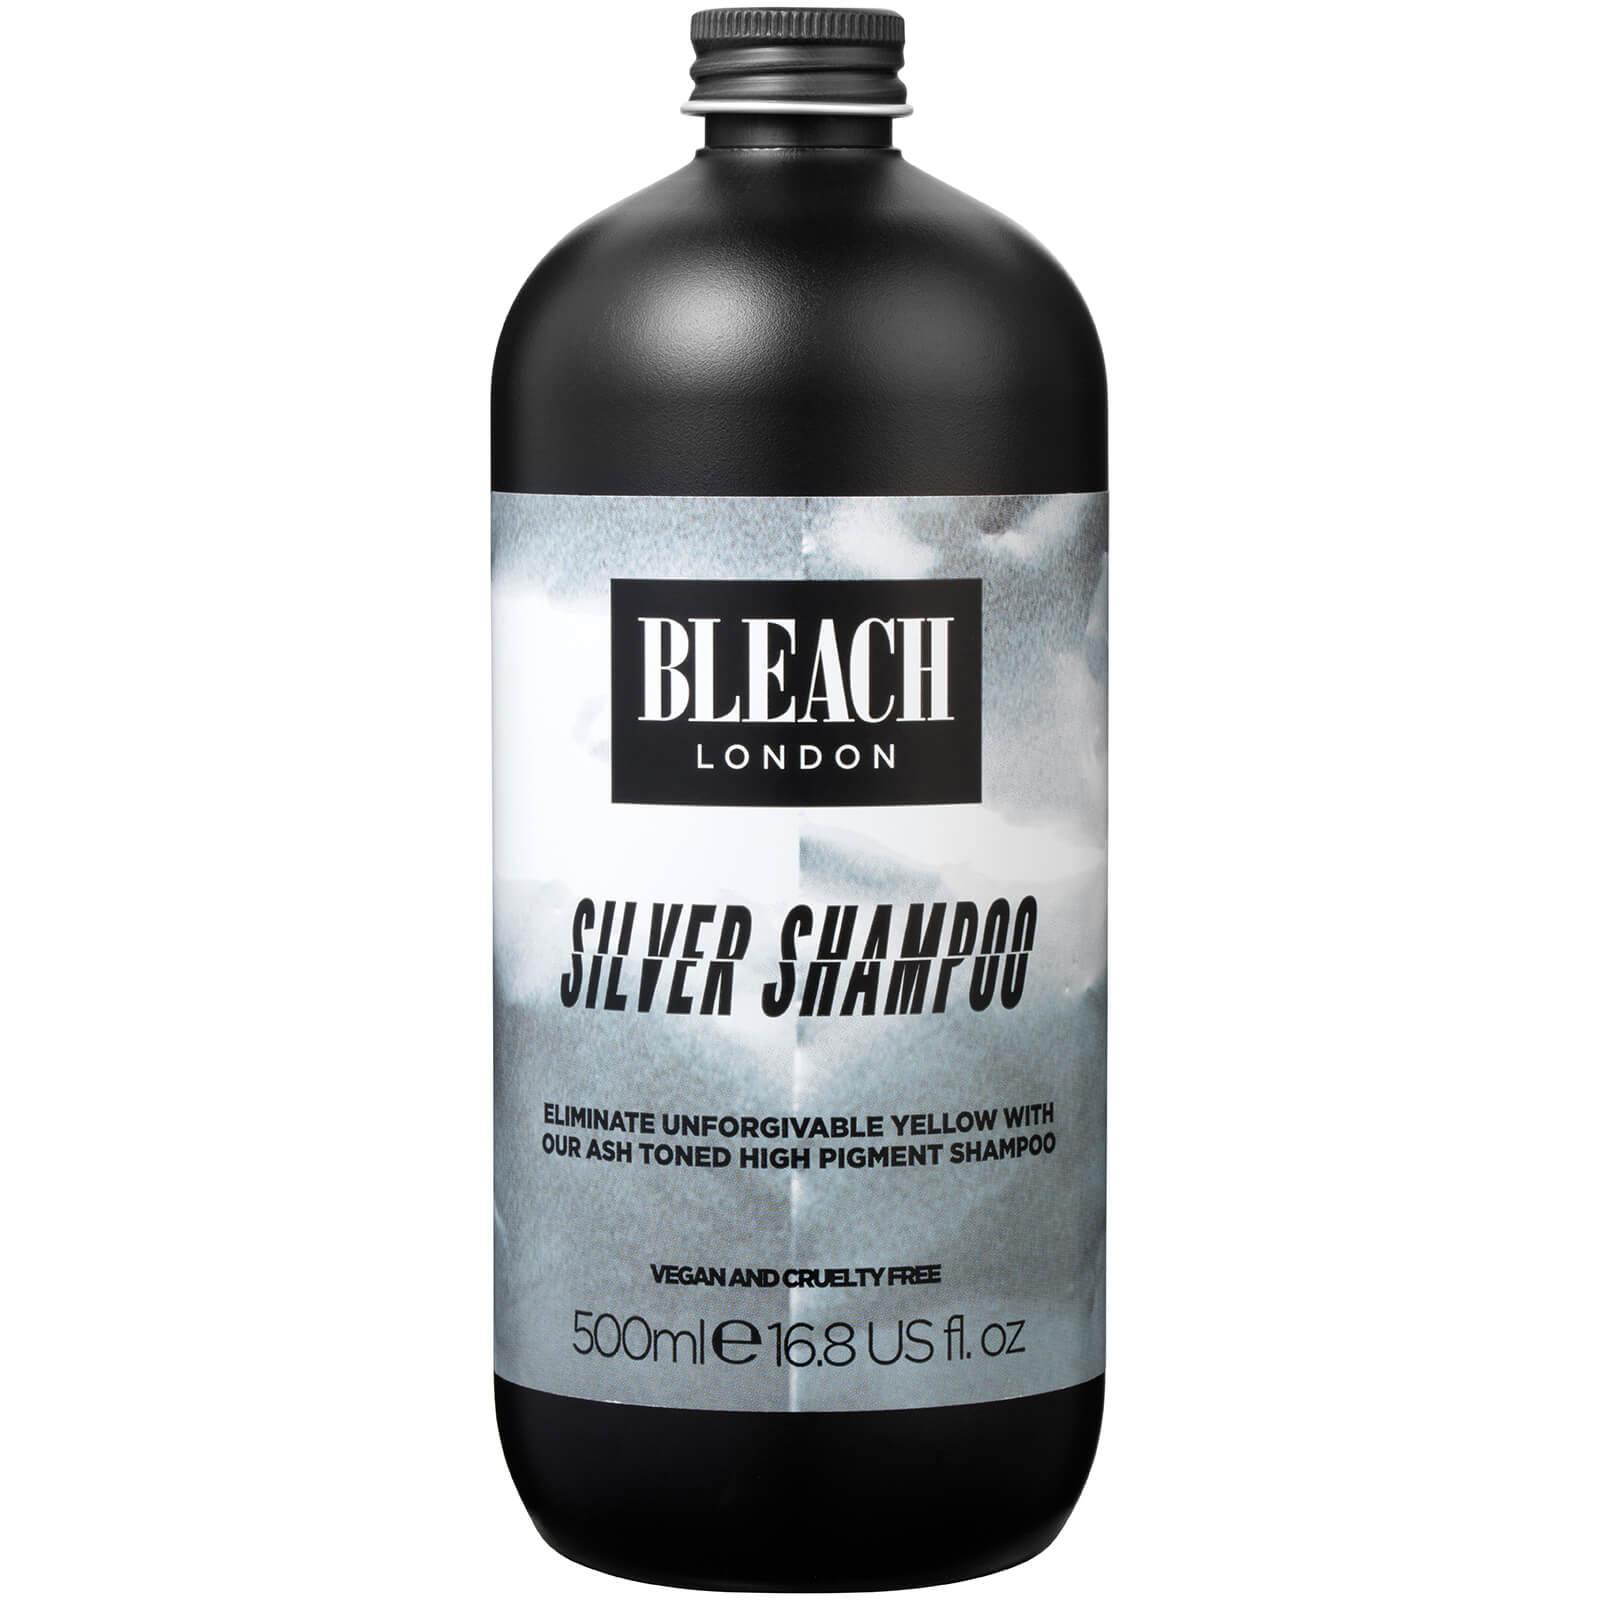 Оттеночный шампунь BLEACH LONDON Silver Shampoo 500 мл  - Купить